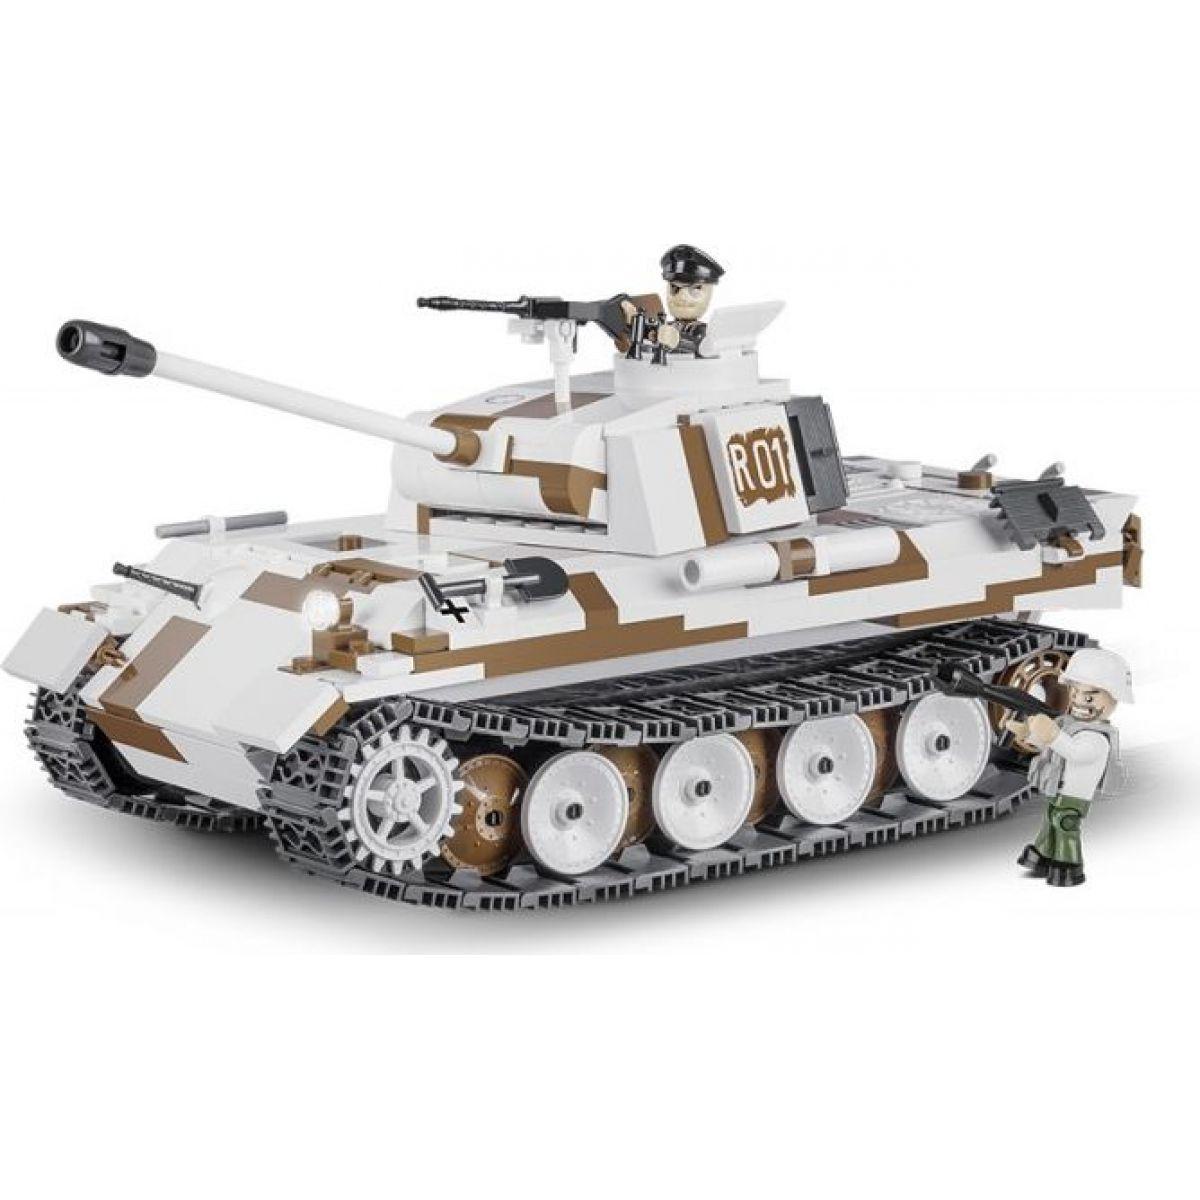 Cobi 2511 SMALL ARMY – II WW PzKpfw V Panther Ausf. A SdKfz 171, 490 k, 2 f